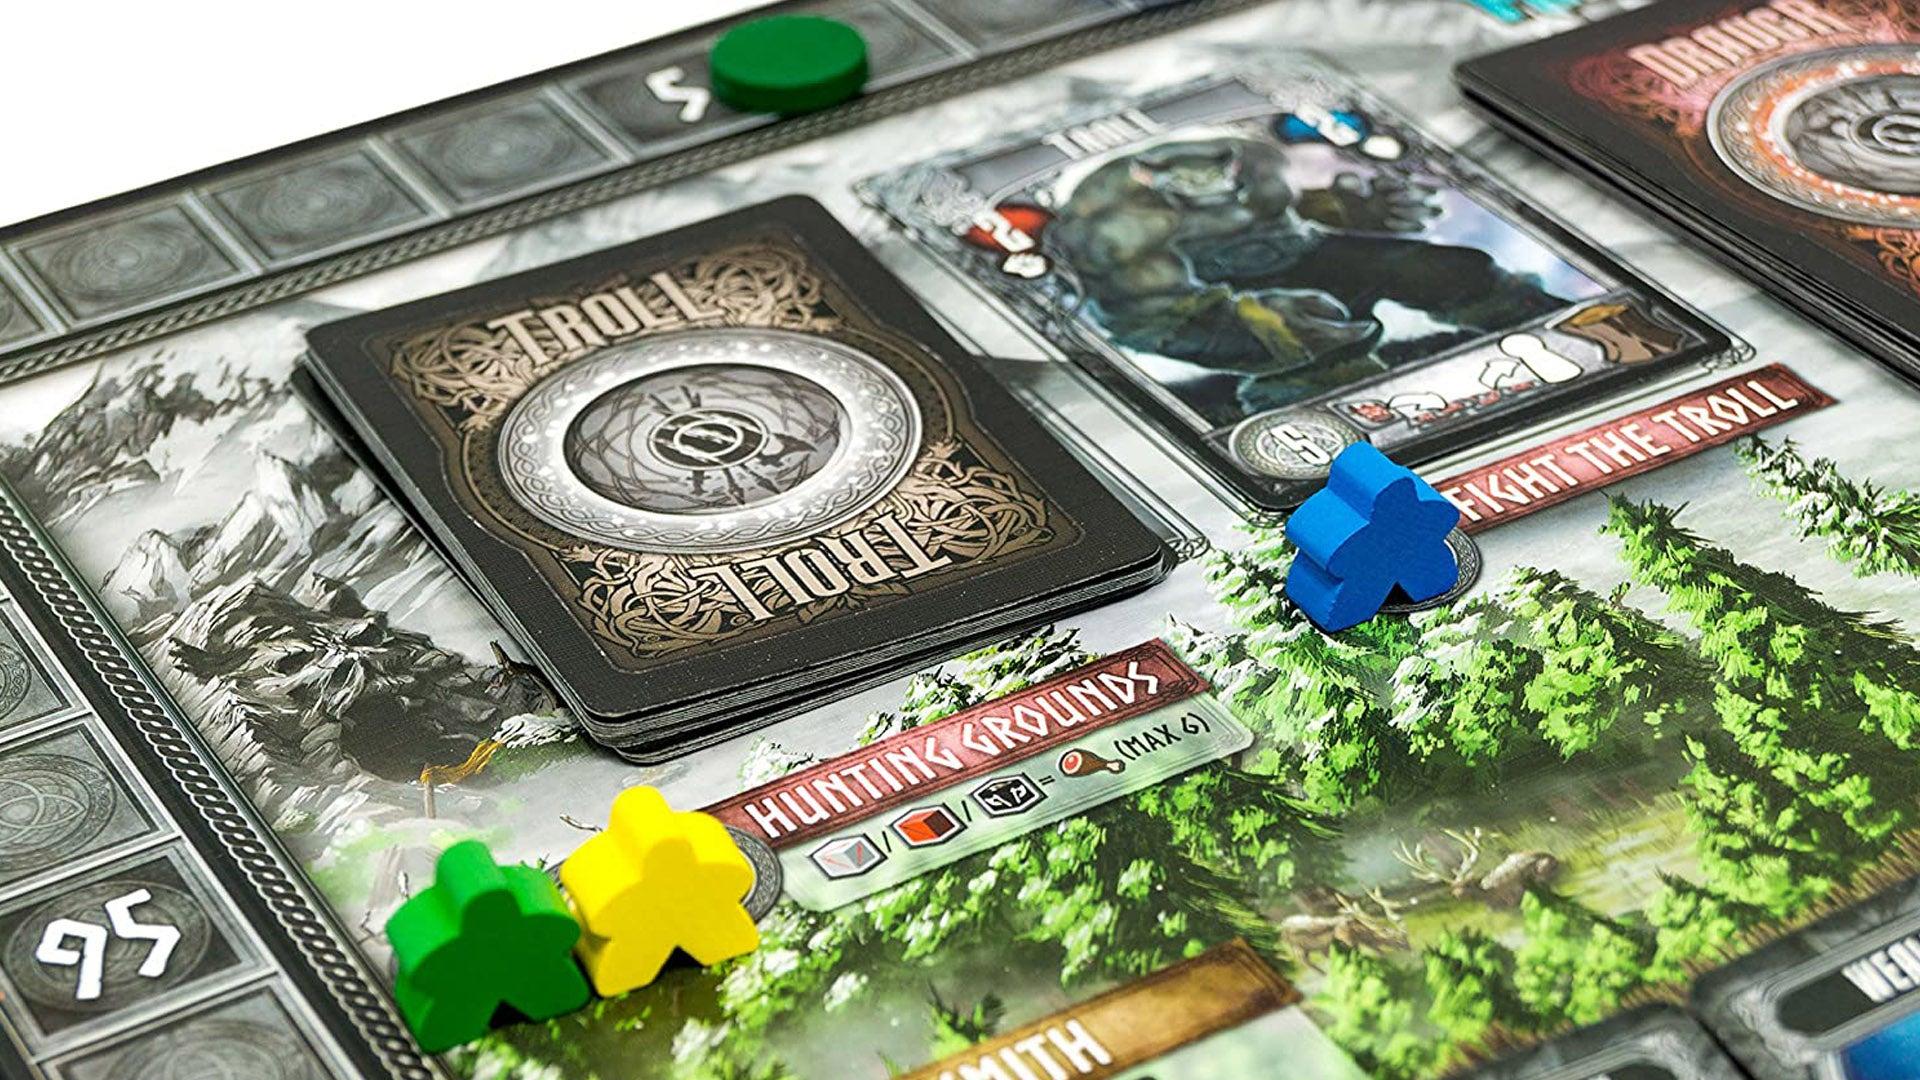 champions-of-midgard-board-game-gameplay-2.jpg